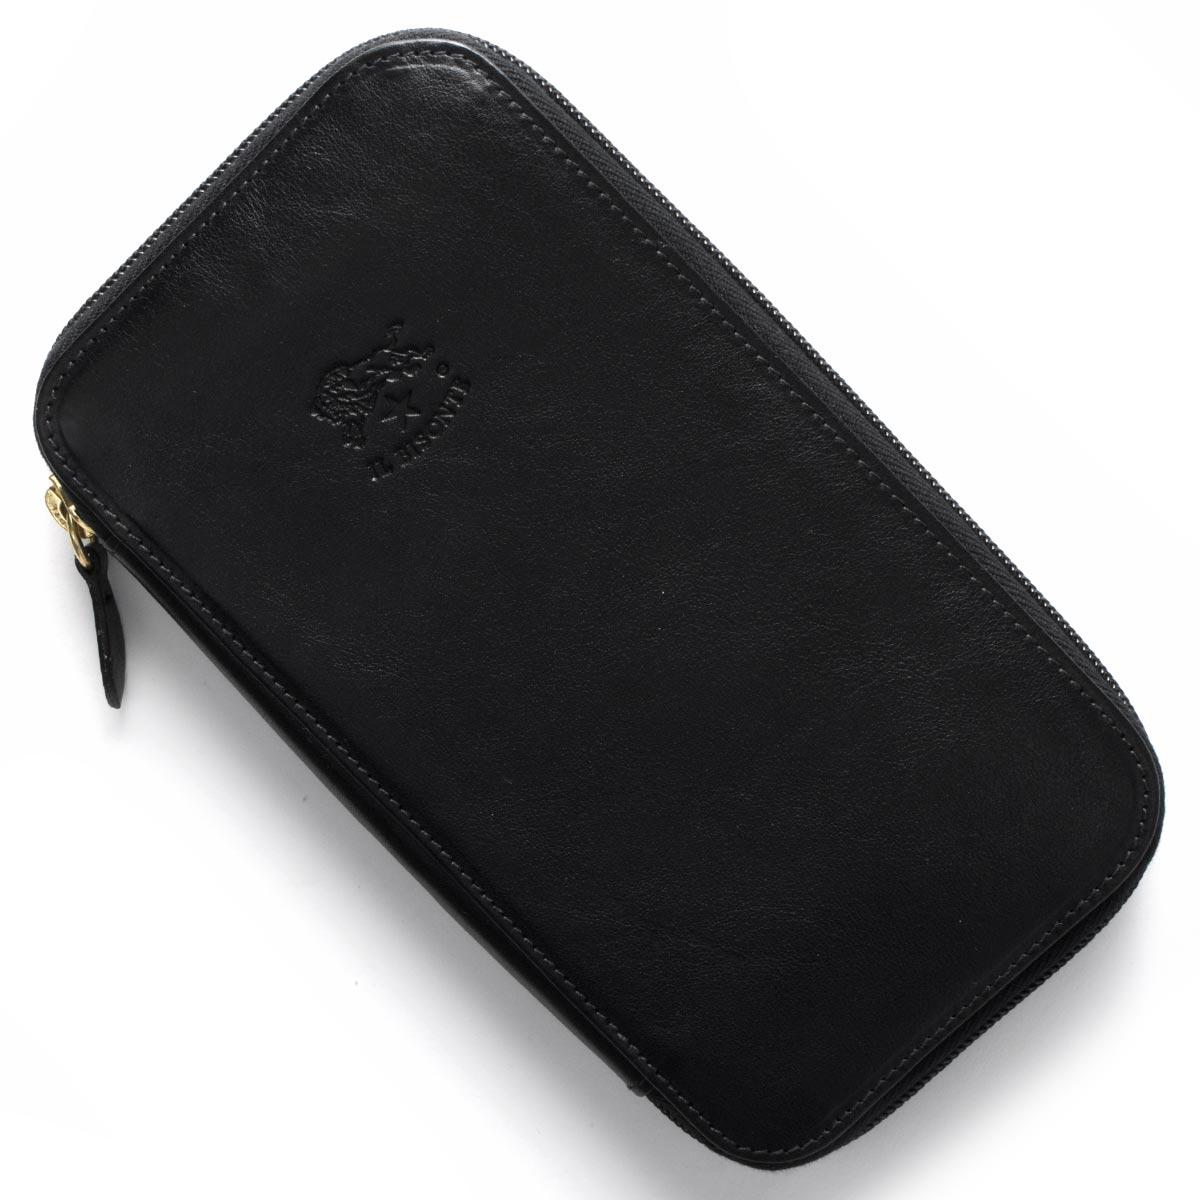 ac336c4e5792 イルビゾンテ長財布財布メンズレディースブラックC0442P153ILBISONTE · IL · BISONTE · 長財布 · ブラック ·  C0442 · P · 153